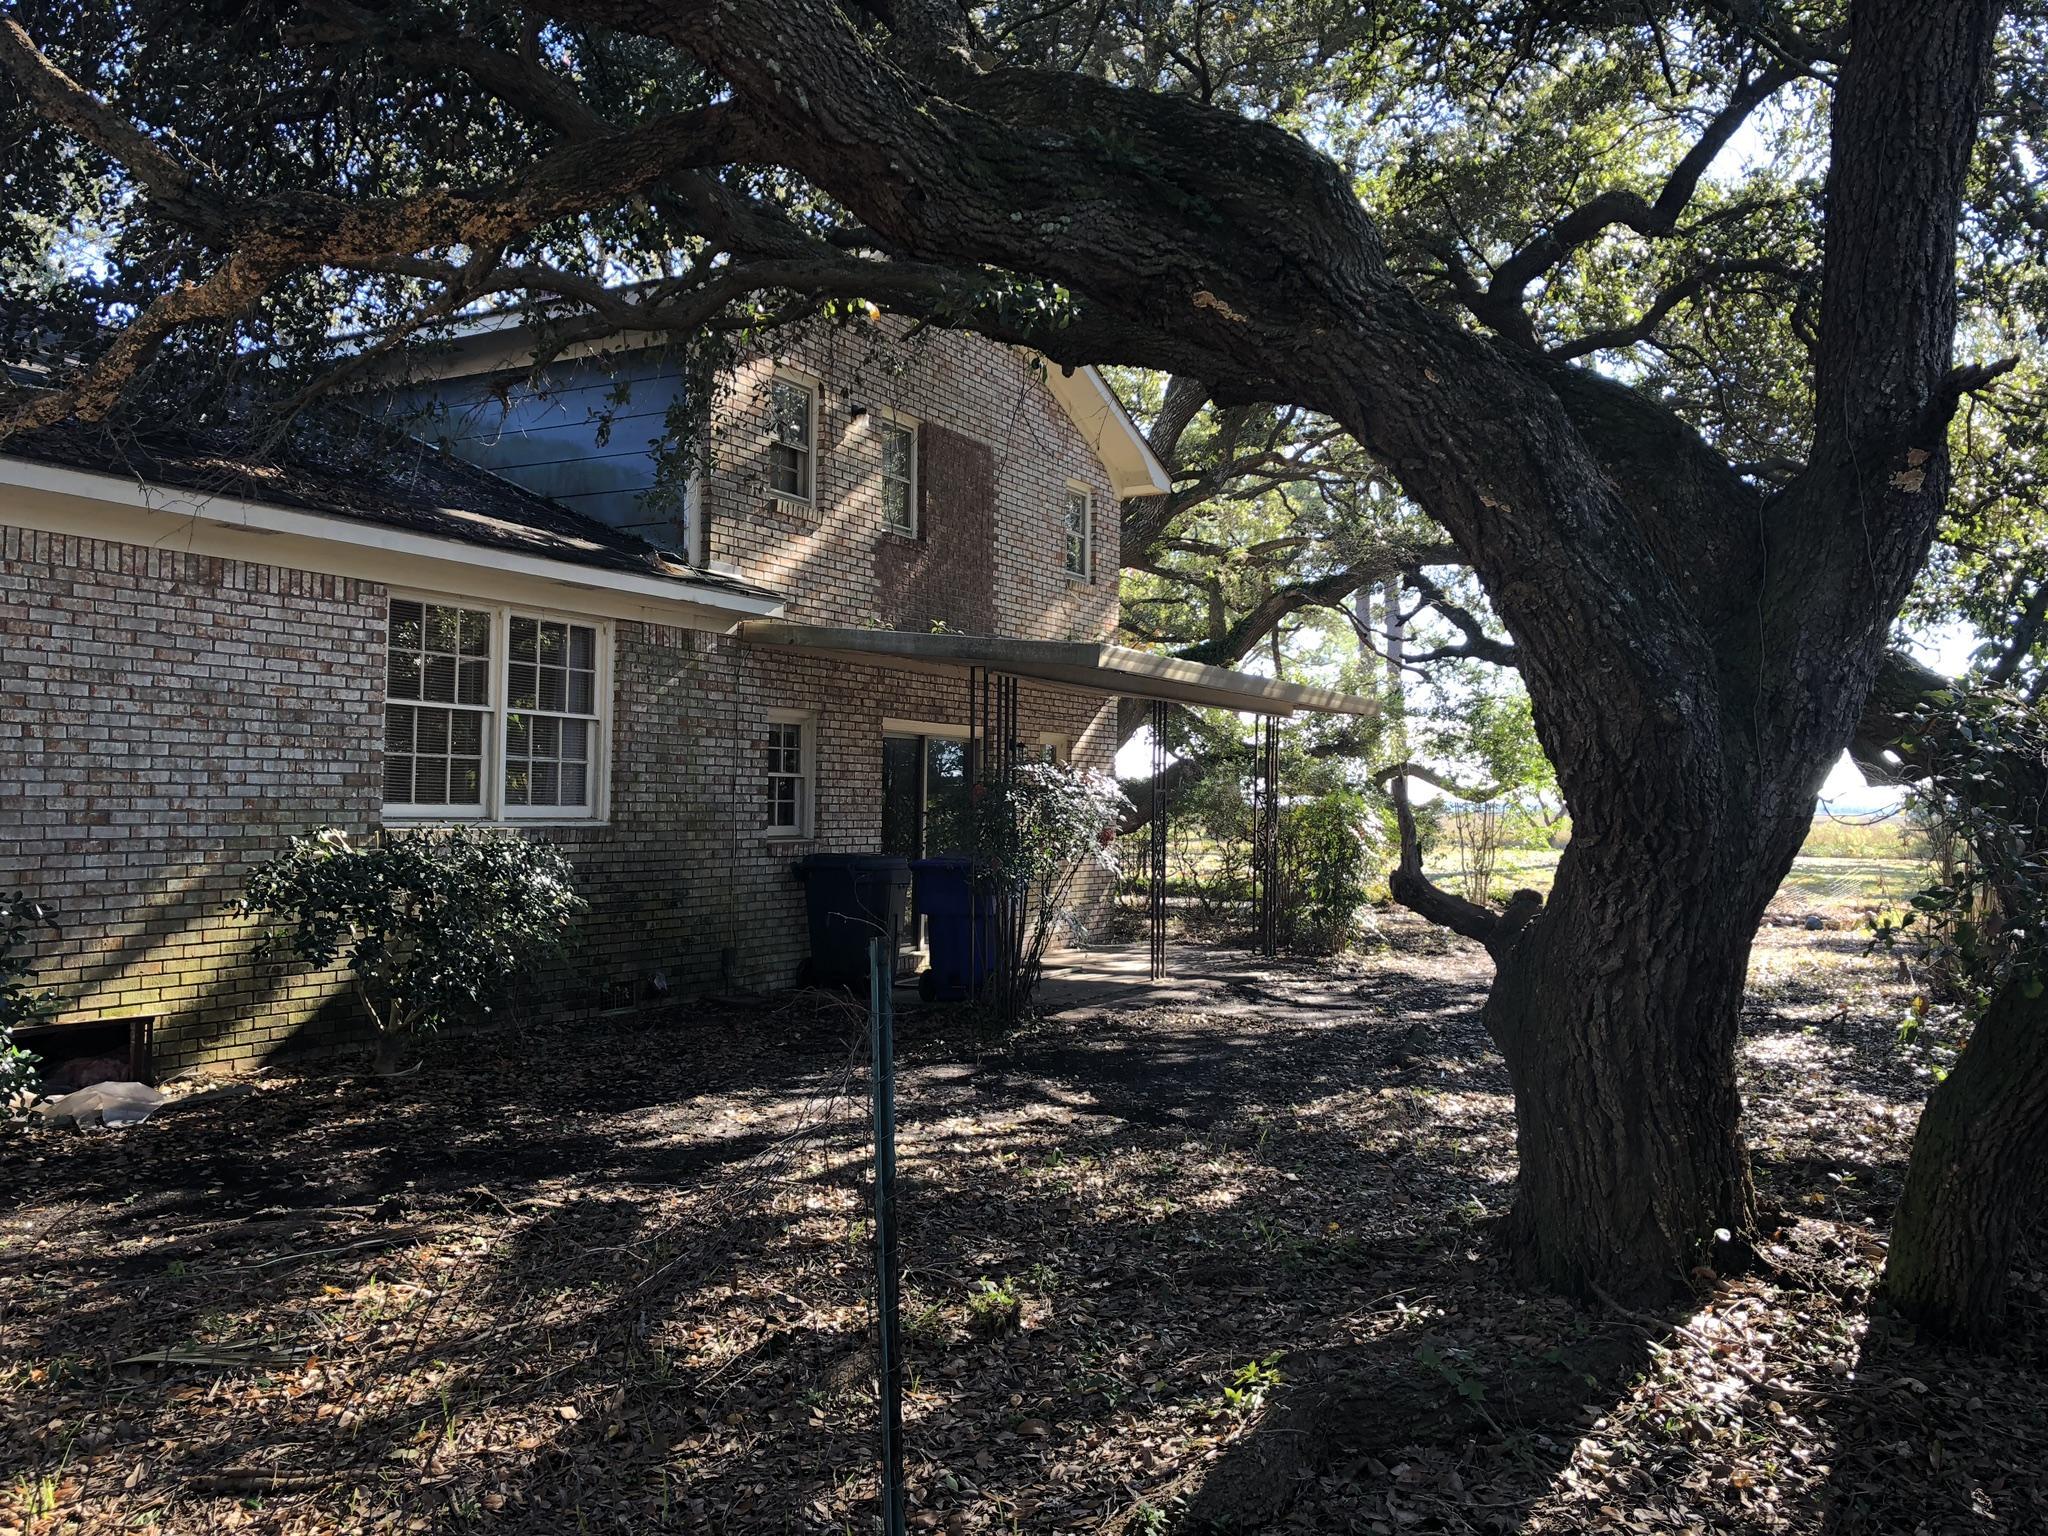 Capri Isles Homes For Sale - 213 Shady, Charleston, SC - 3